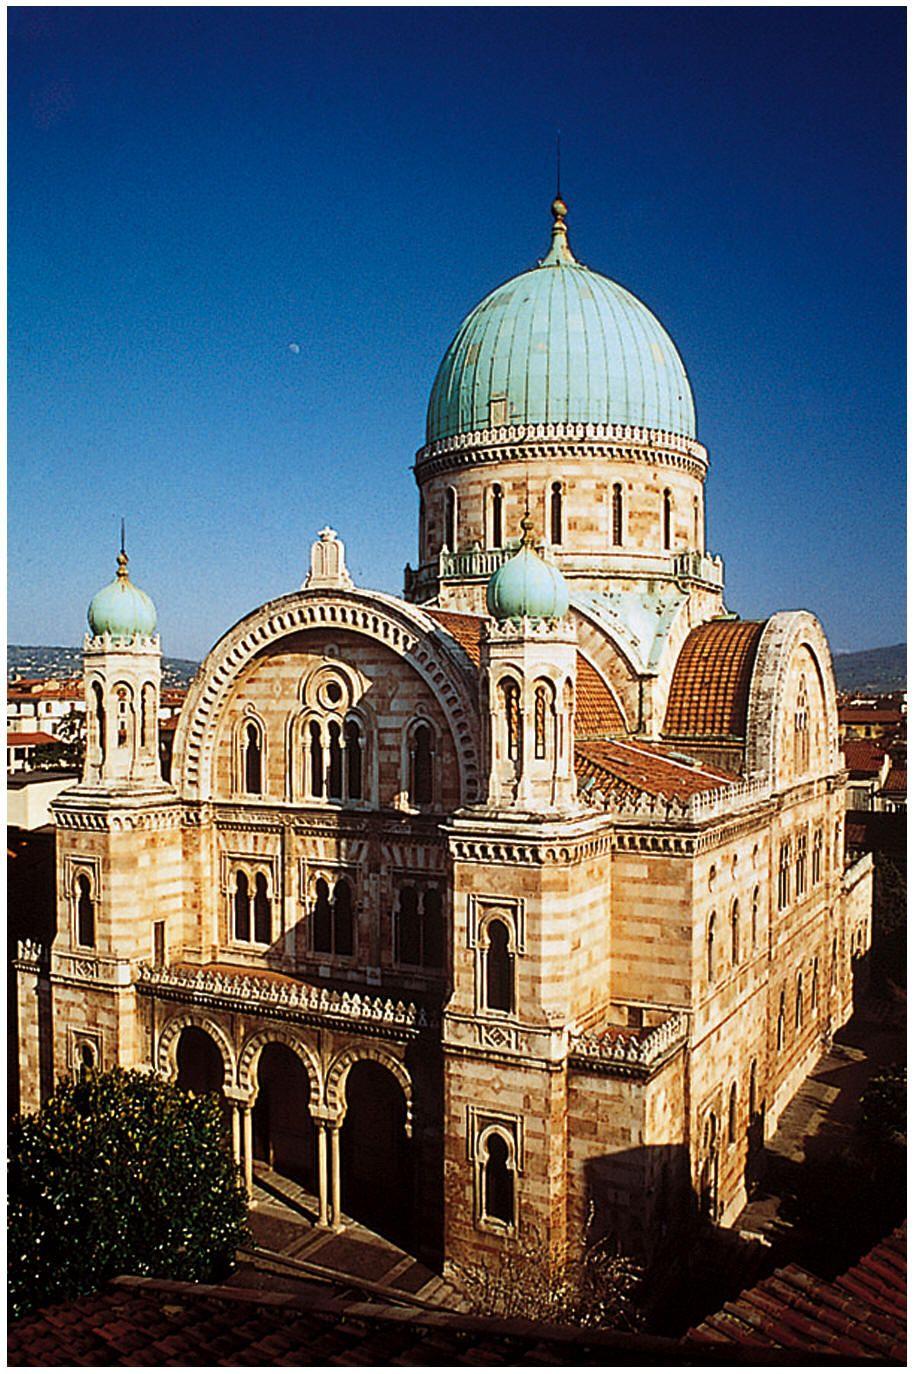 Italian Florence: Trieste Ghetto - Sinagoga